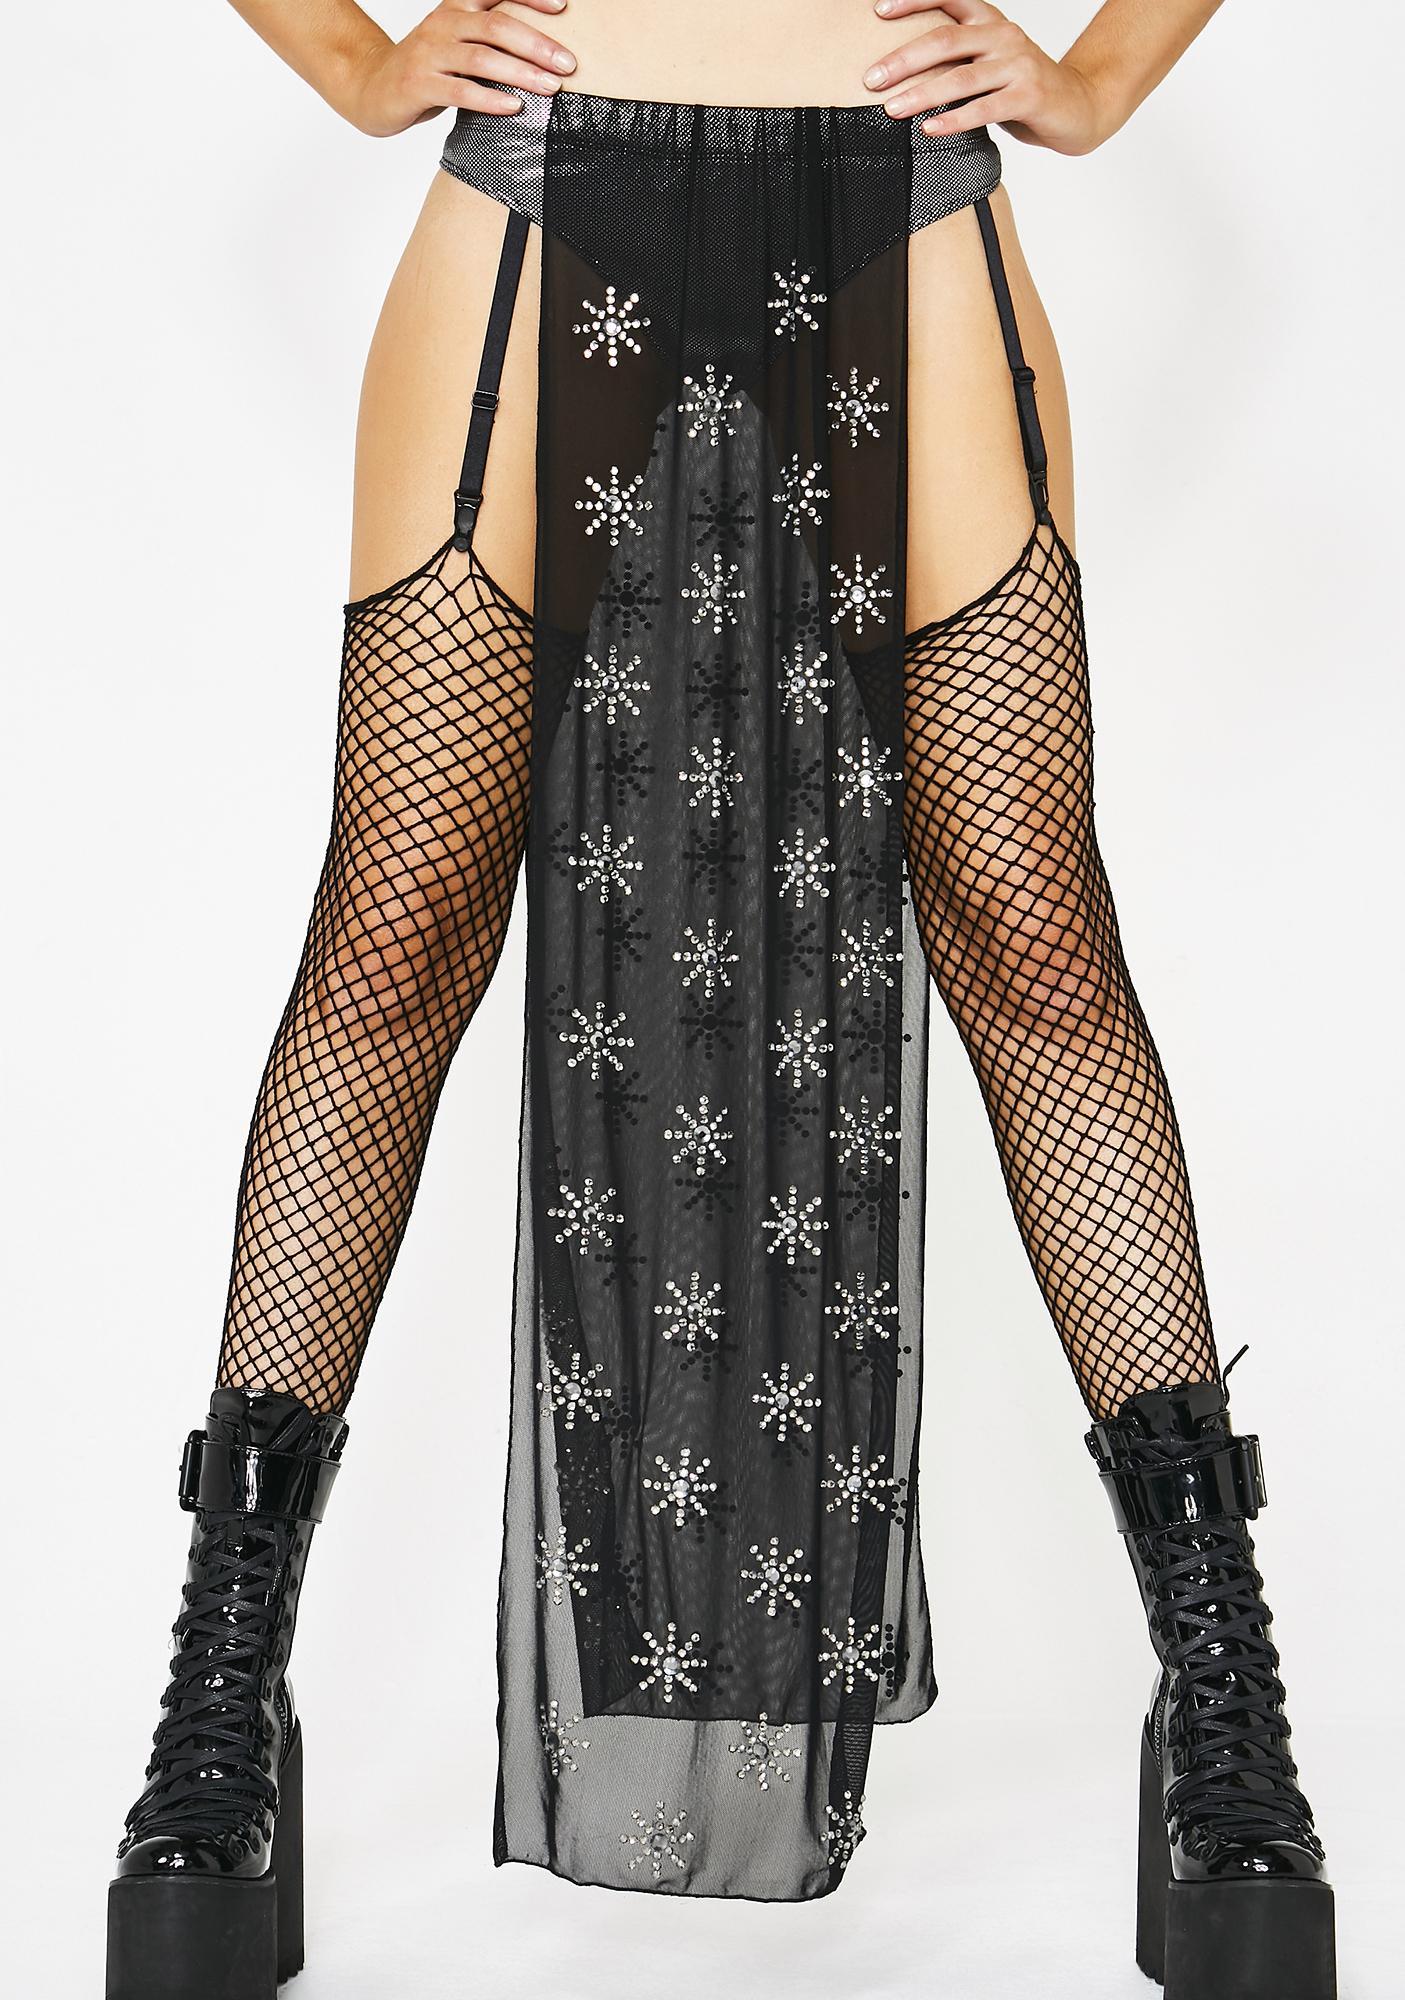 Club Exx Cosmos Grace Mesh Skirt